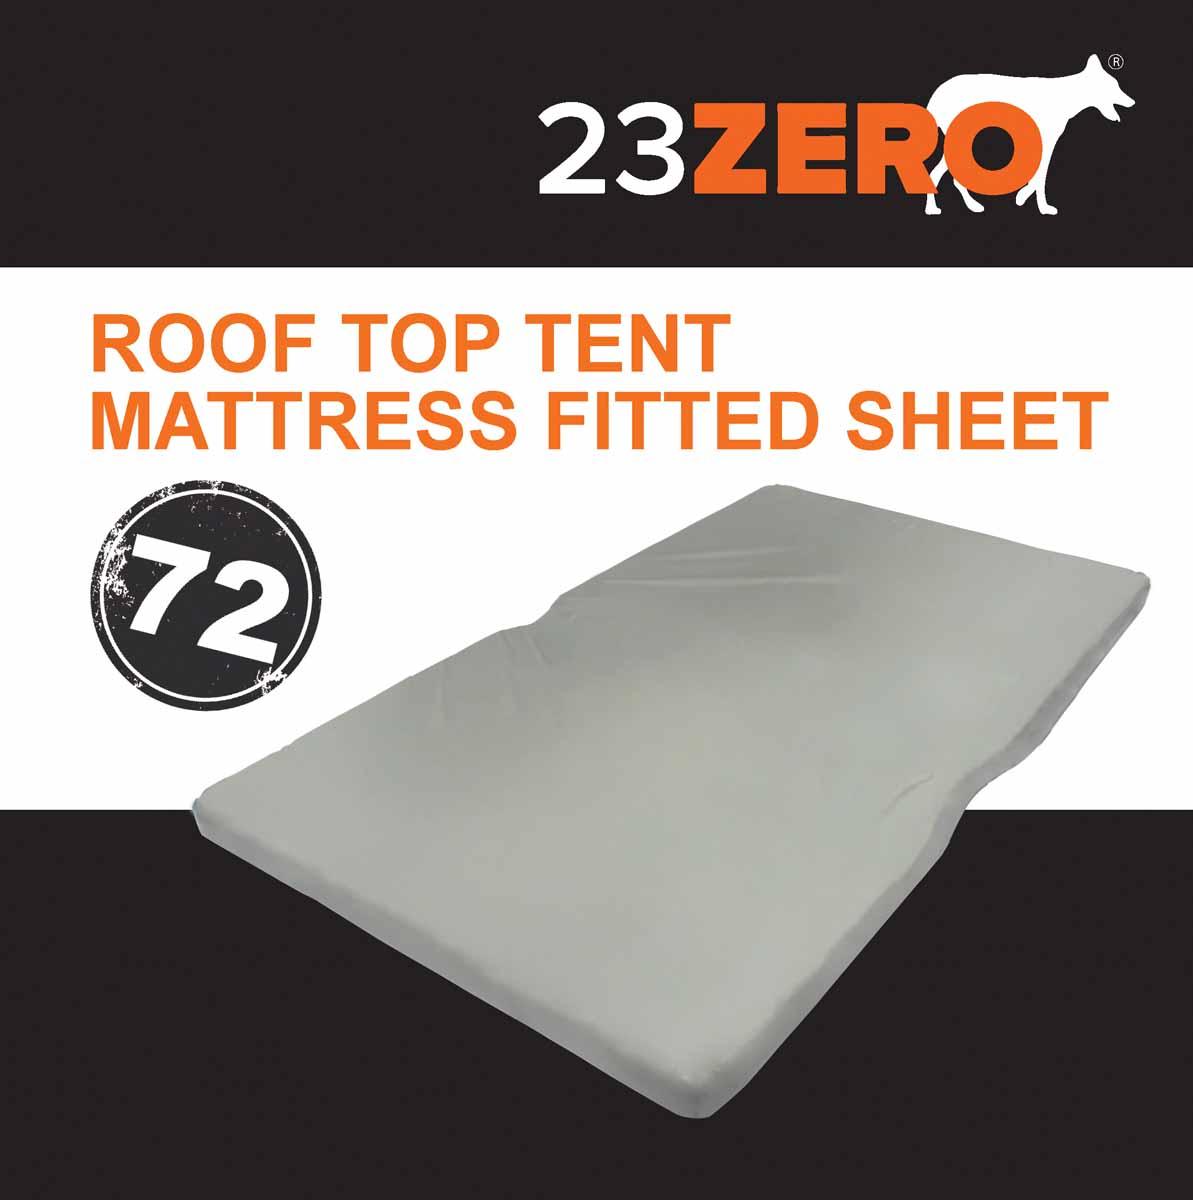 roof top tent mattress fitted sheet 72